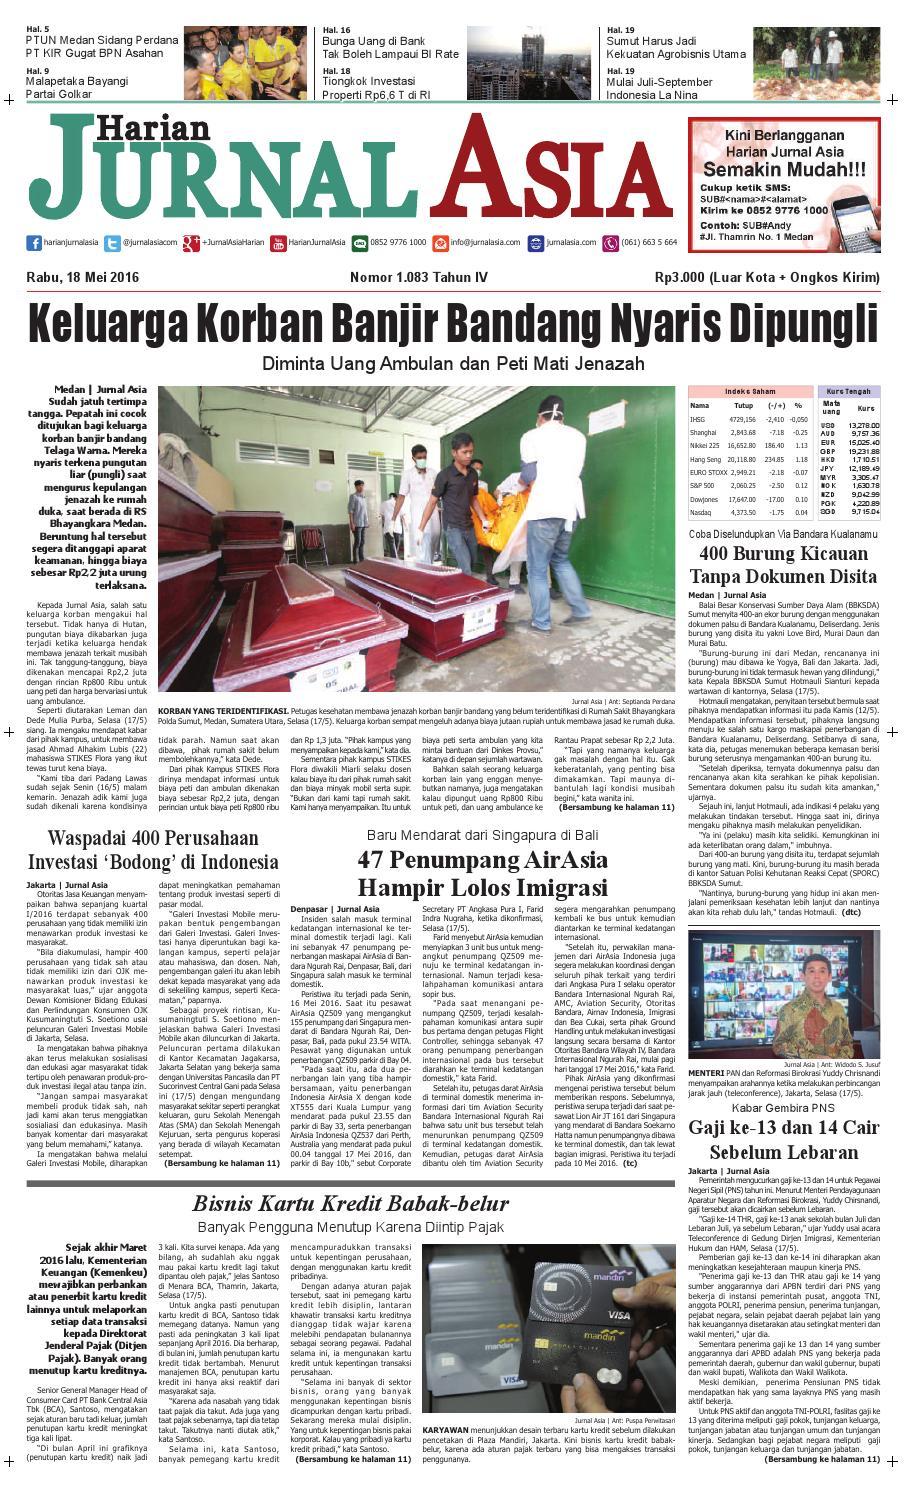 Harian Jurnal Asia Edisi Rabu 18 Mei 2016 By Produk Ukm Bumn Kain Batik Eksklusif Lasem Manuk Medan Issuu